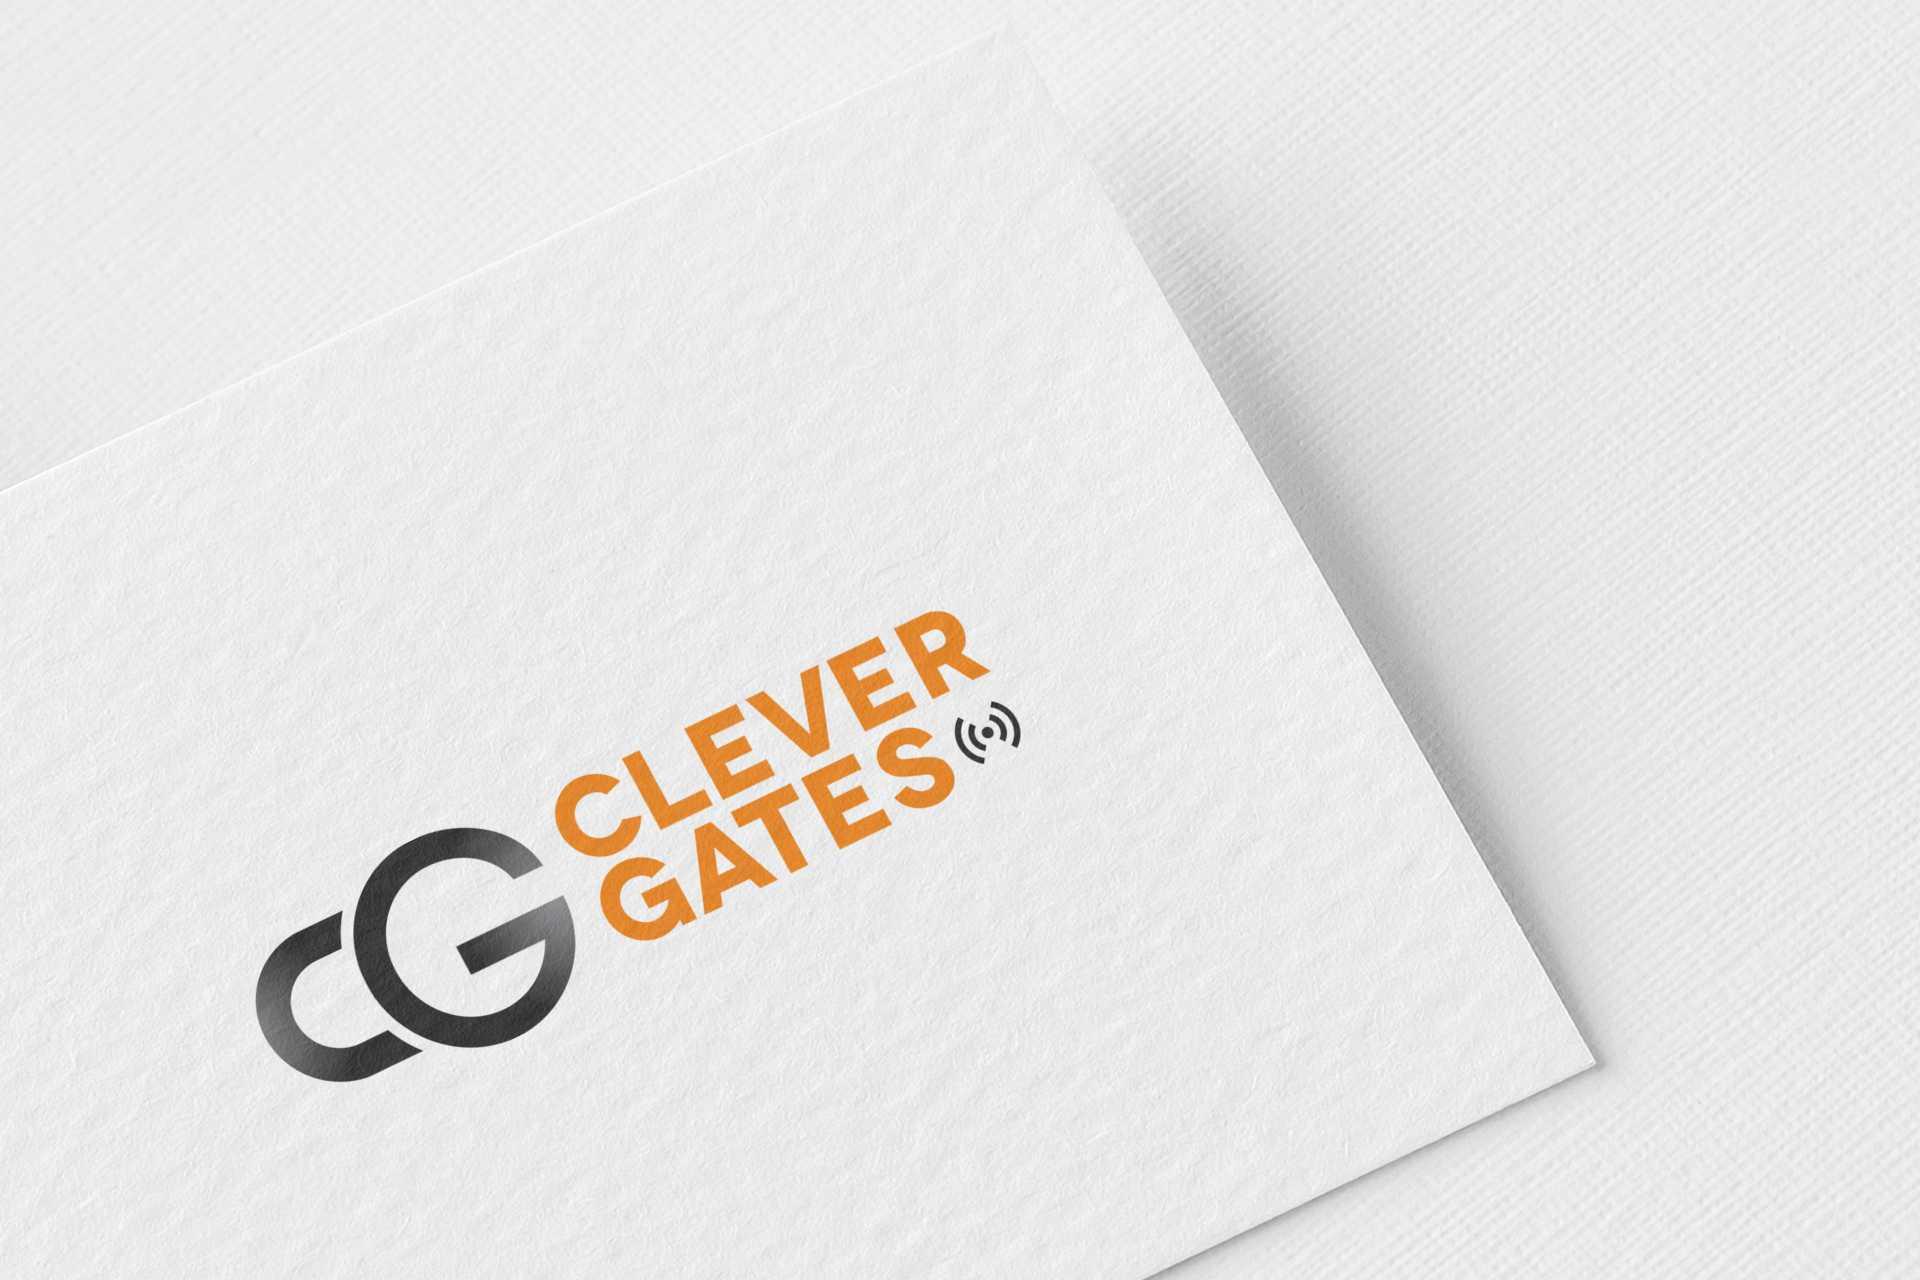 pixel-perfect-warrington-clever-gates-logo-design